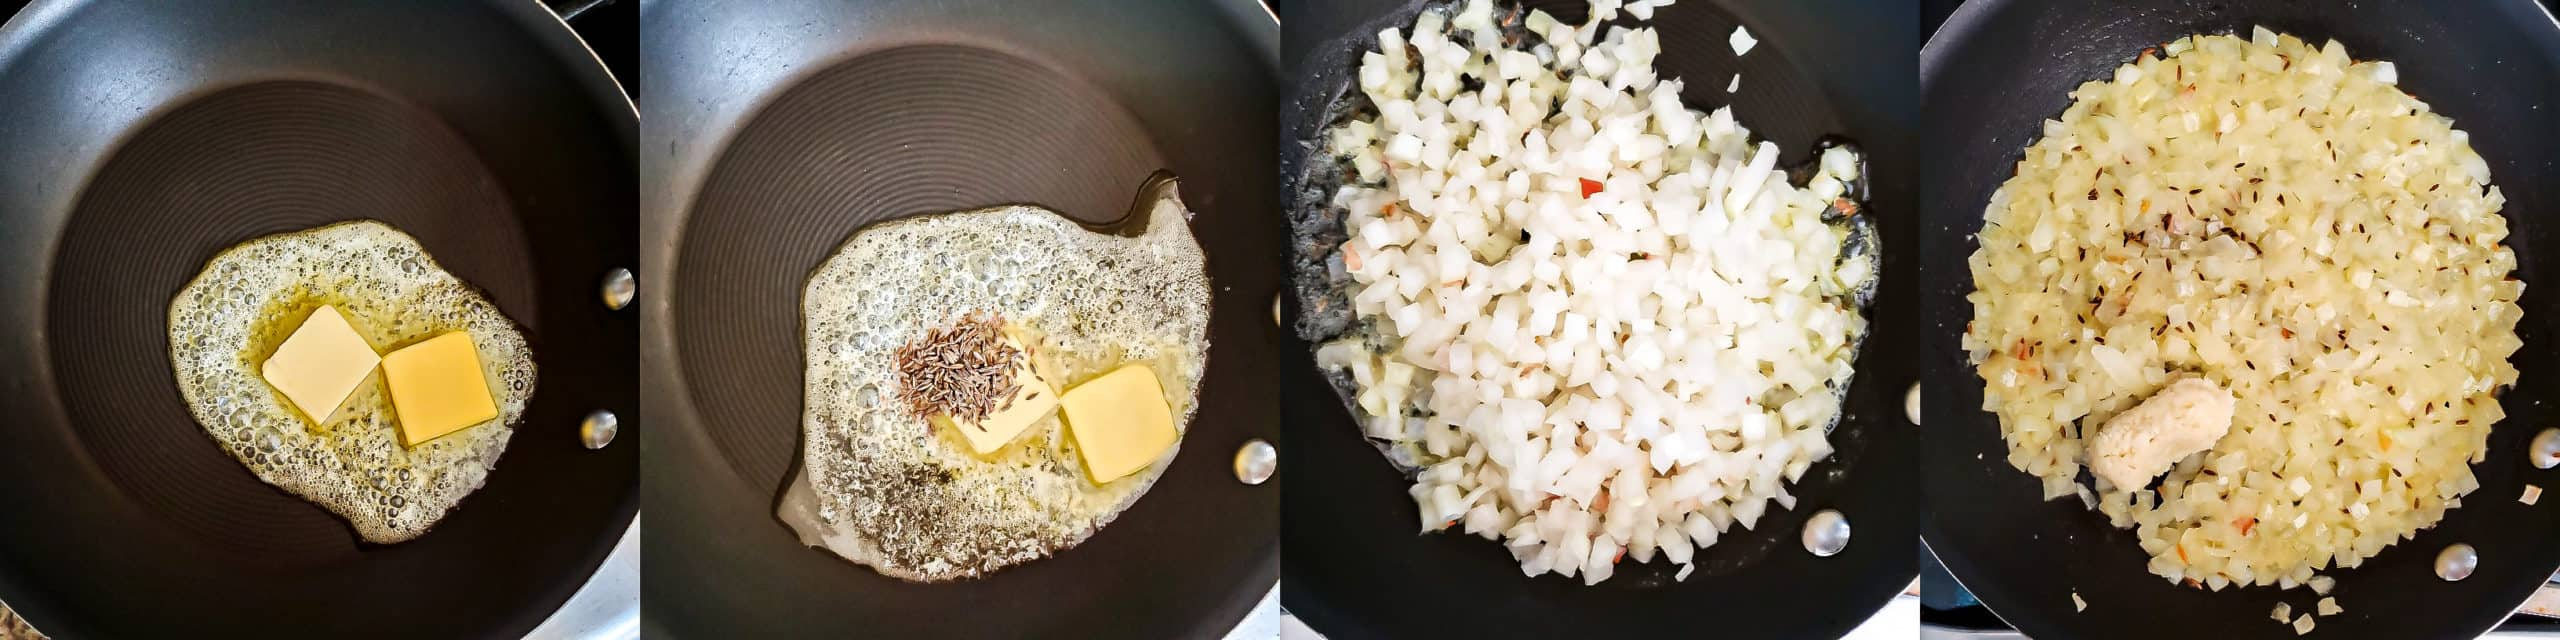 Step 1 - Cheesy Garlic Masala Pav Sliders